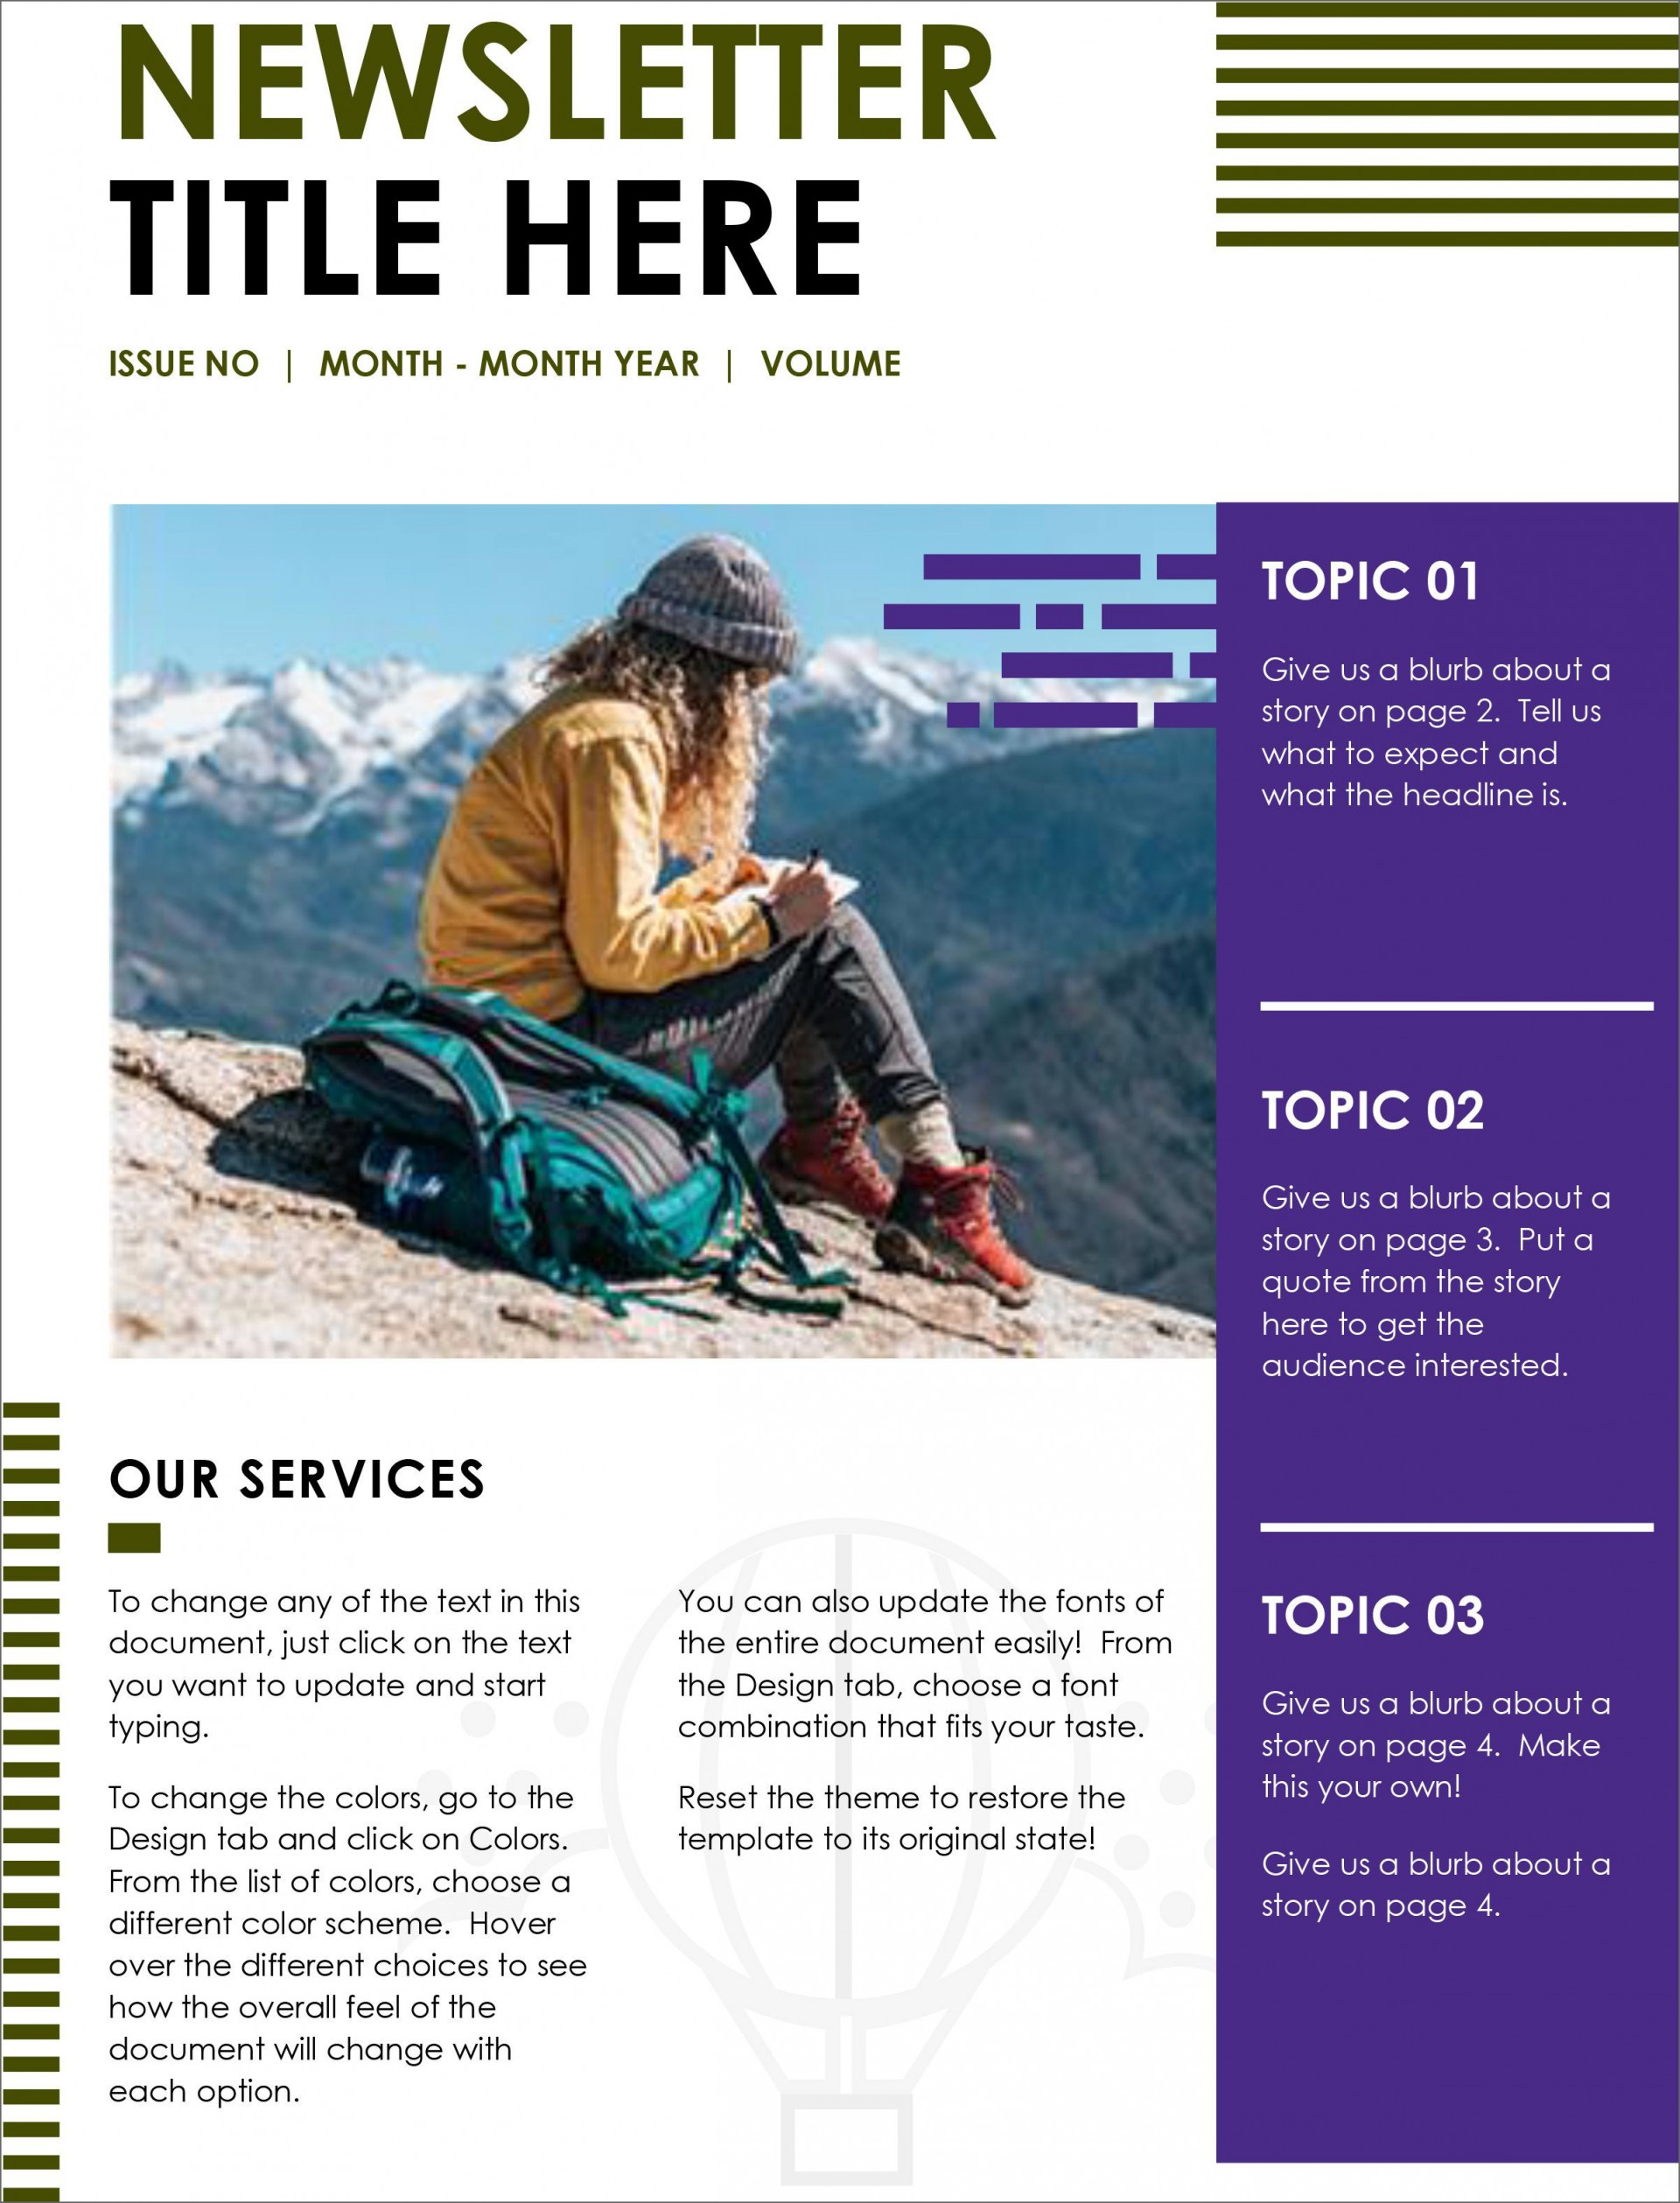 003 Impressive High School Newsletter Template Free Download Inspiration 1920